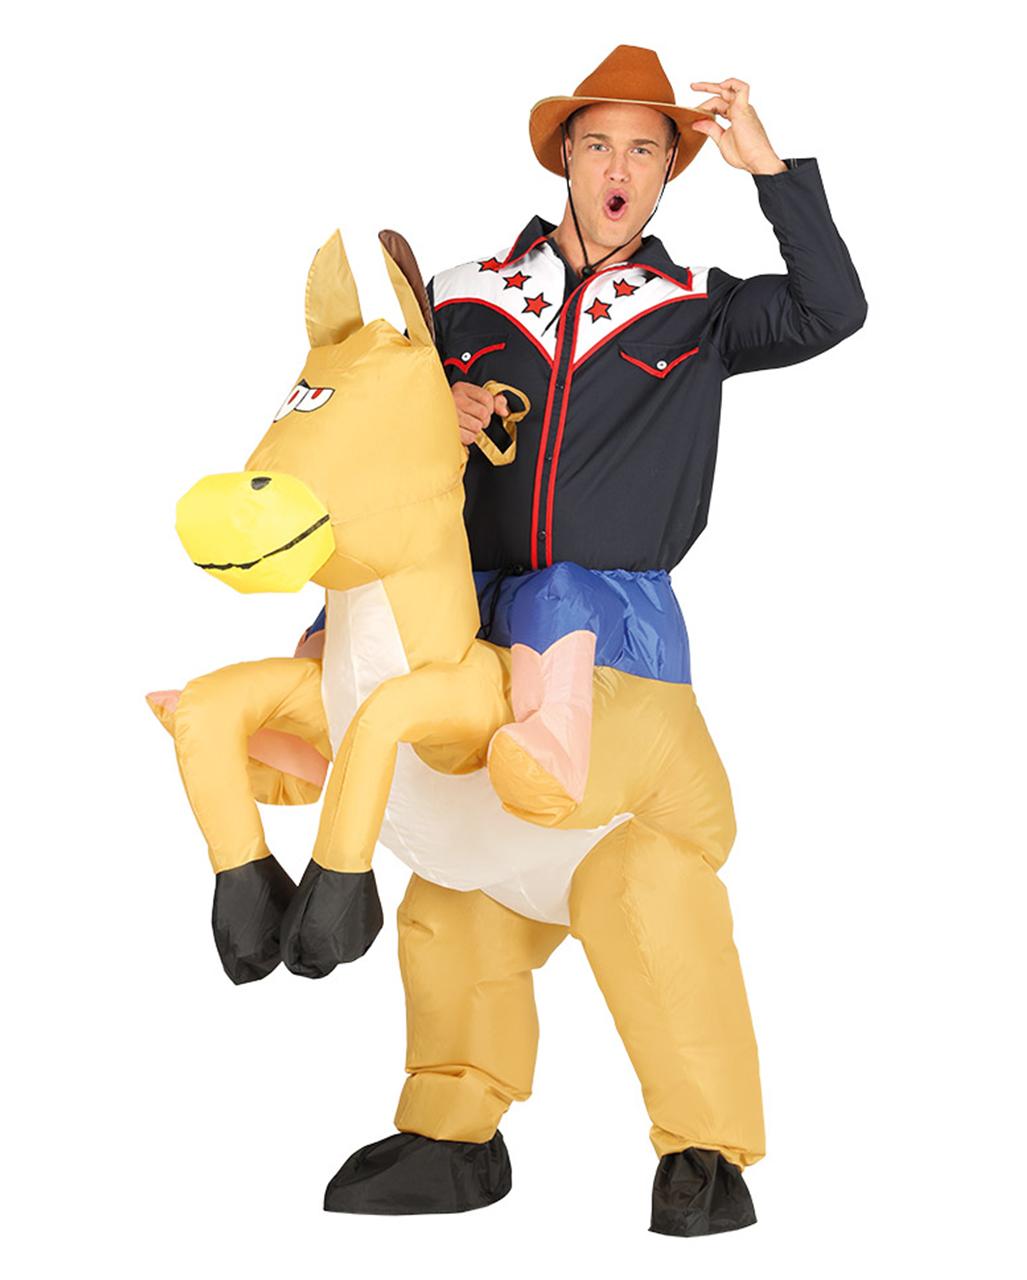 Cowboy Piggyback Costume Inflatable  sc 1 st  Horror-Shop.com & Cowboy Piggyback Costume Inflatable to order | horror-shop.com